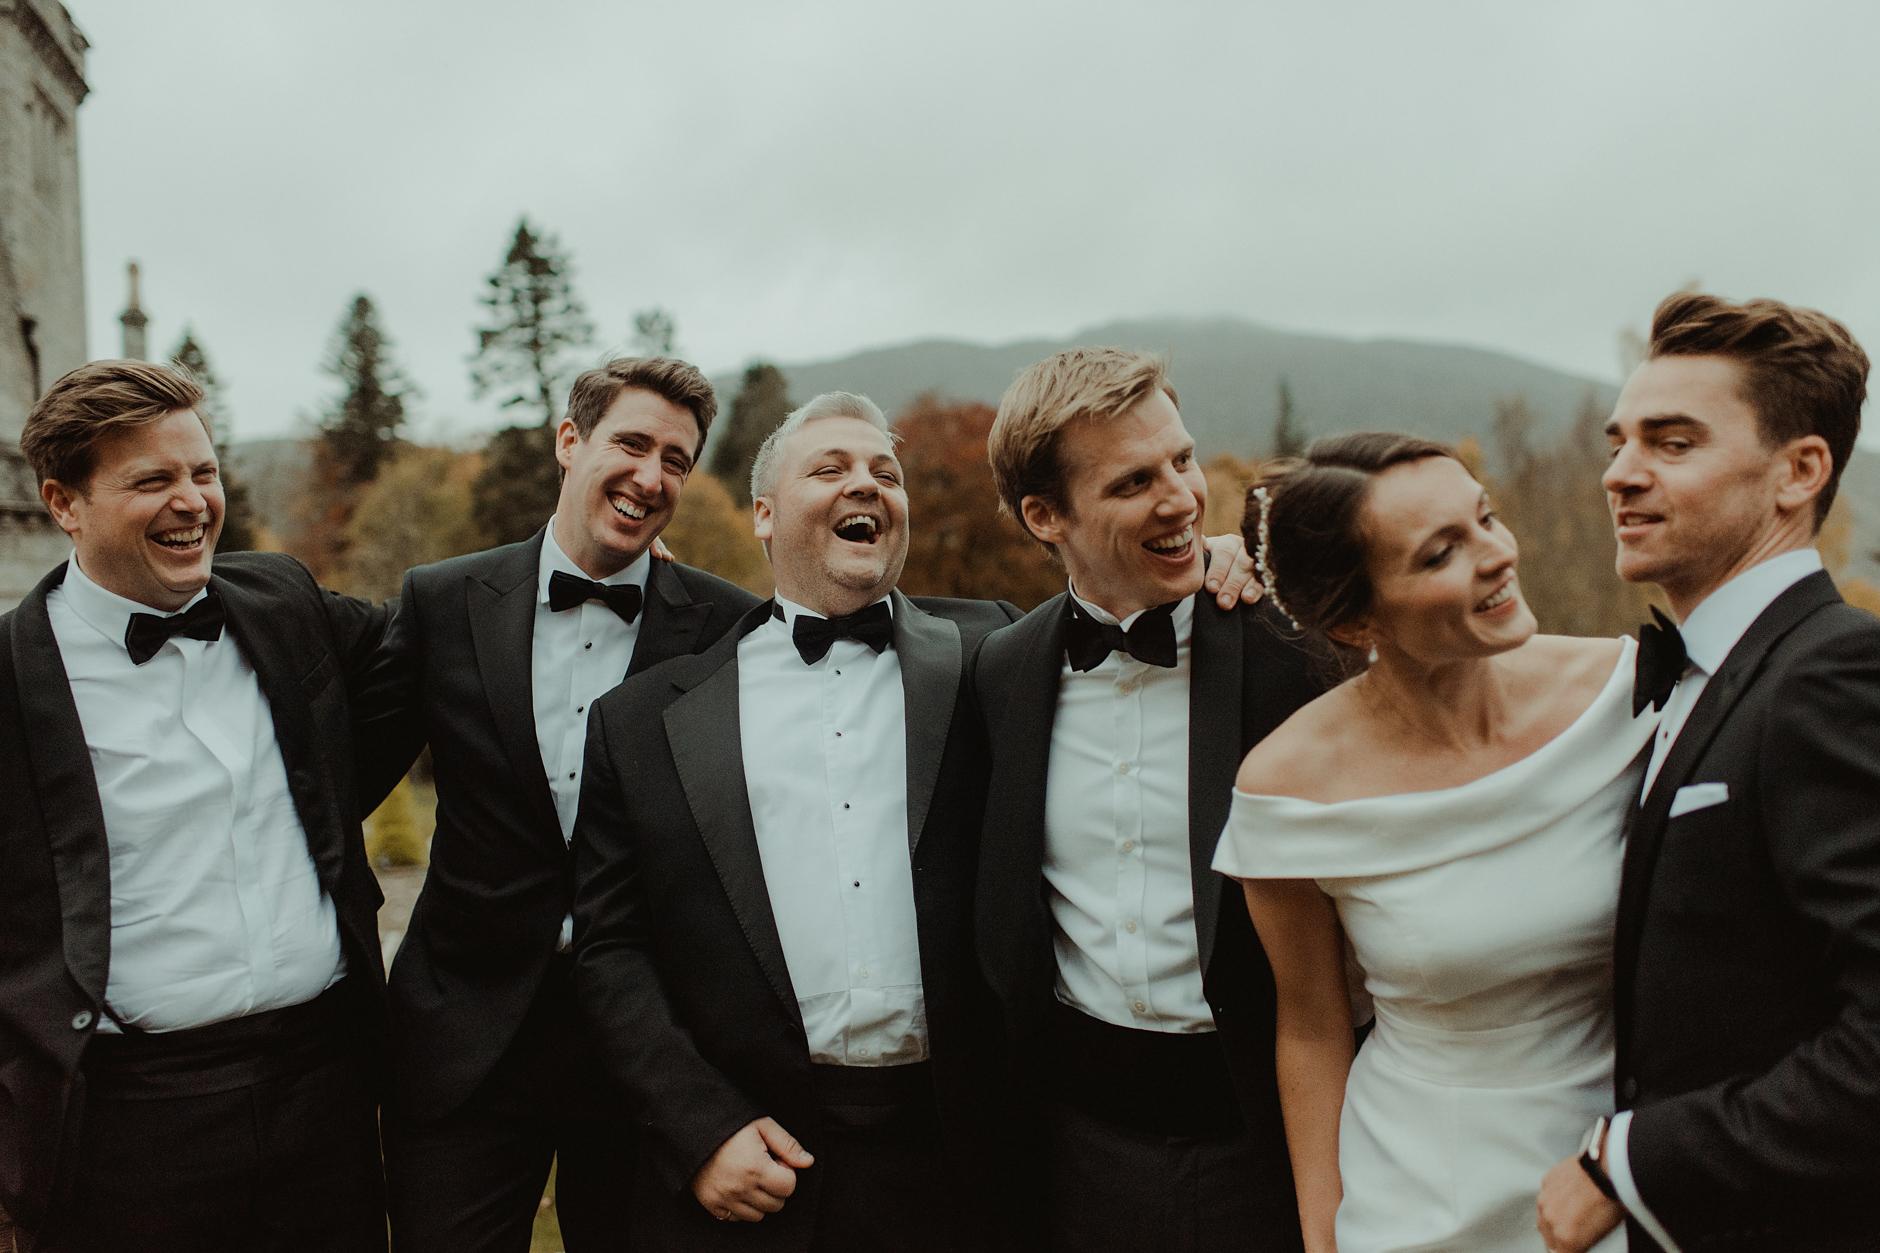 Glentruim-Wedding-Nikki-Leadbetter-Photography-223.jpg